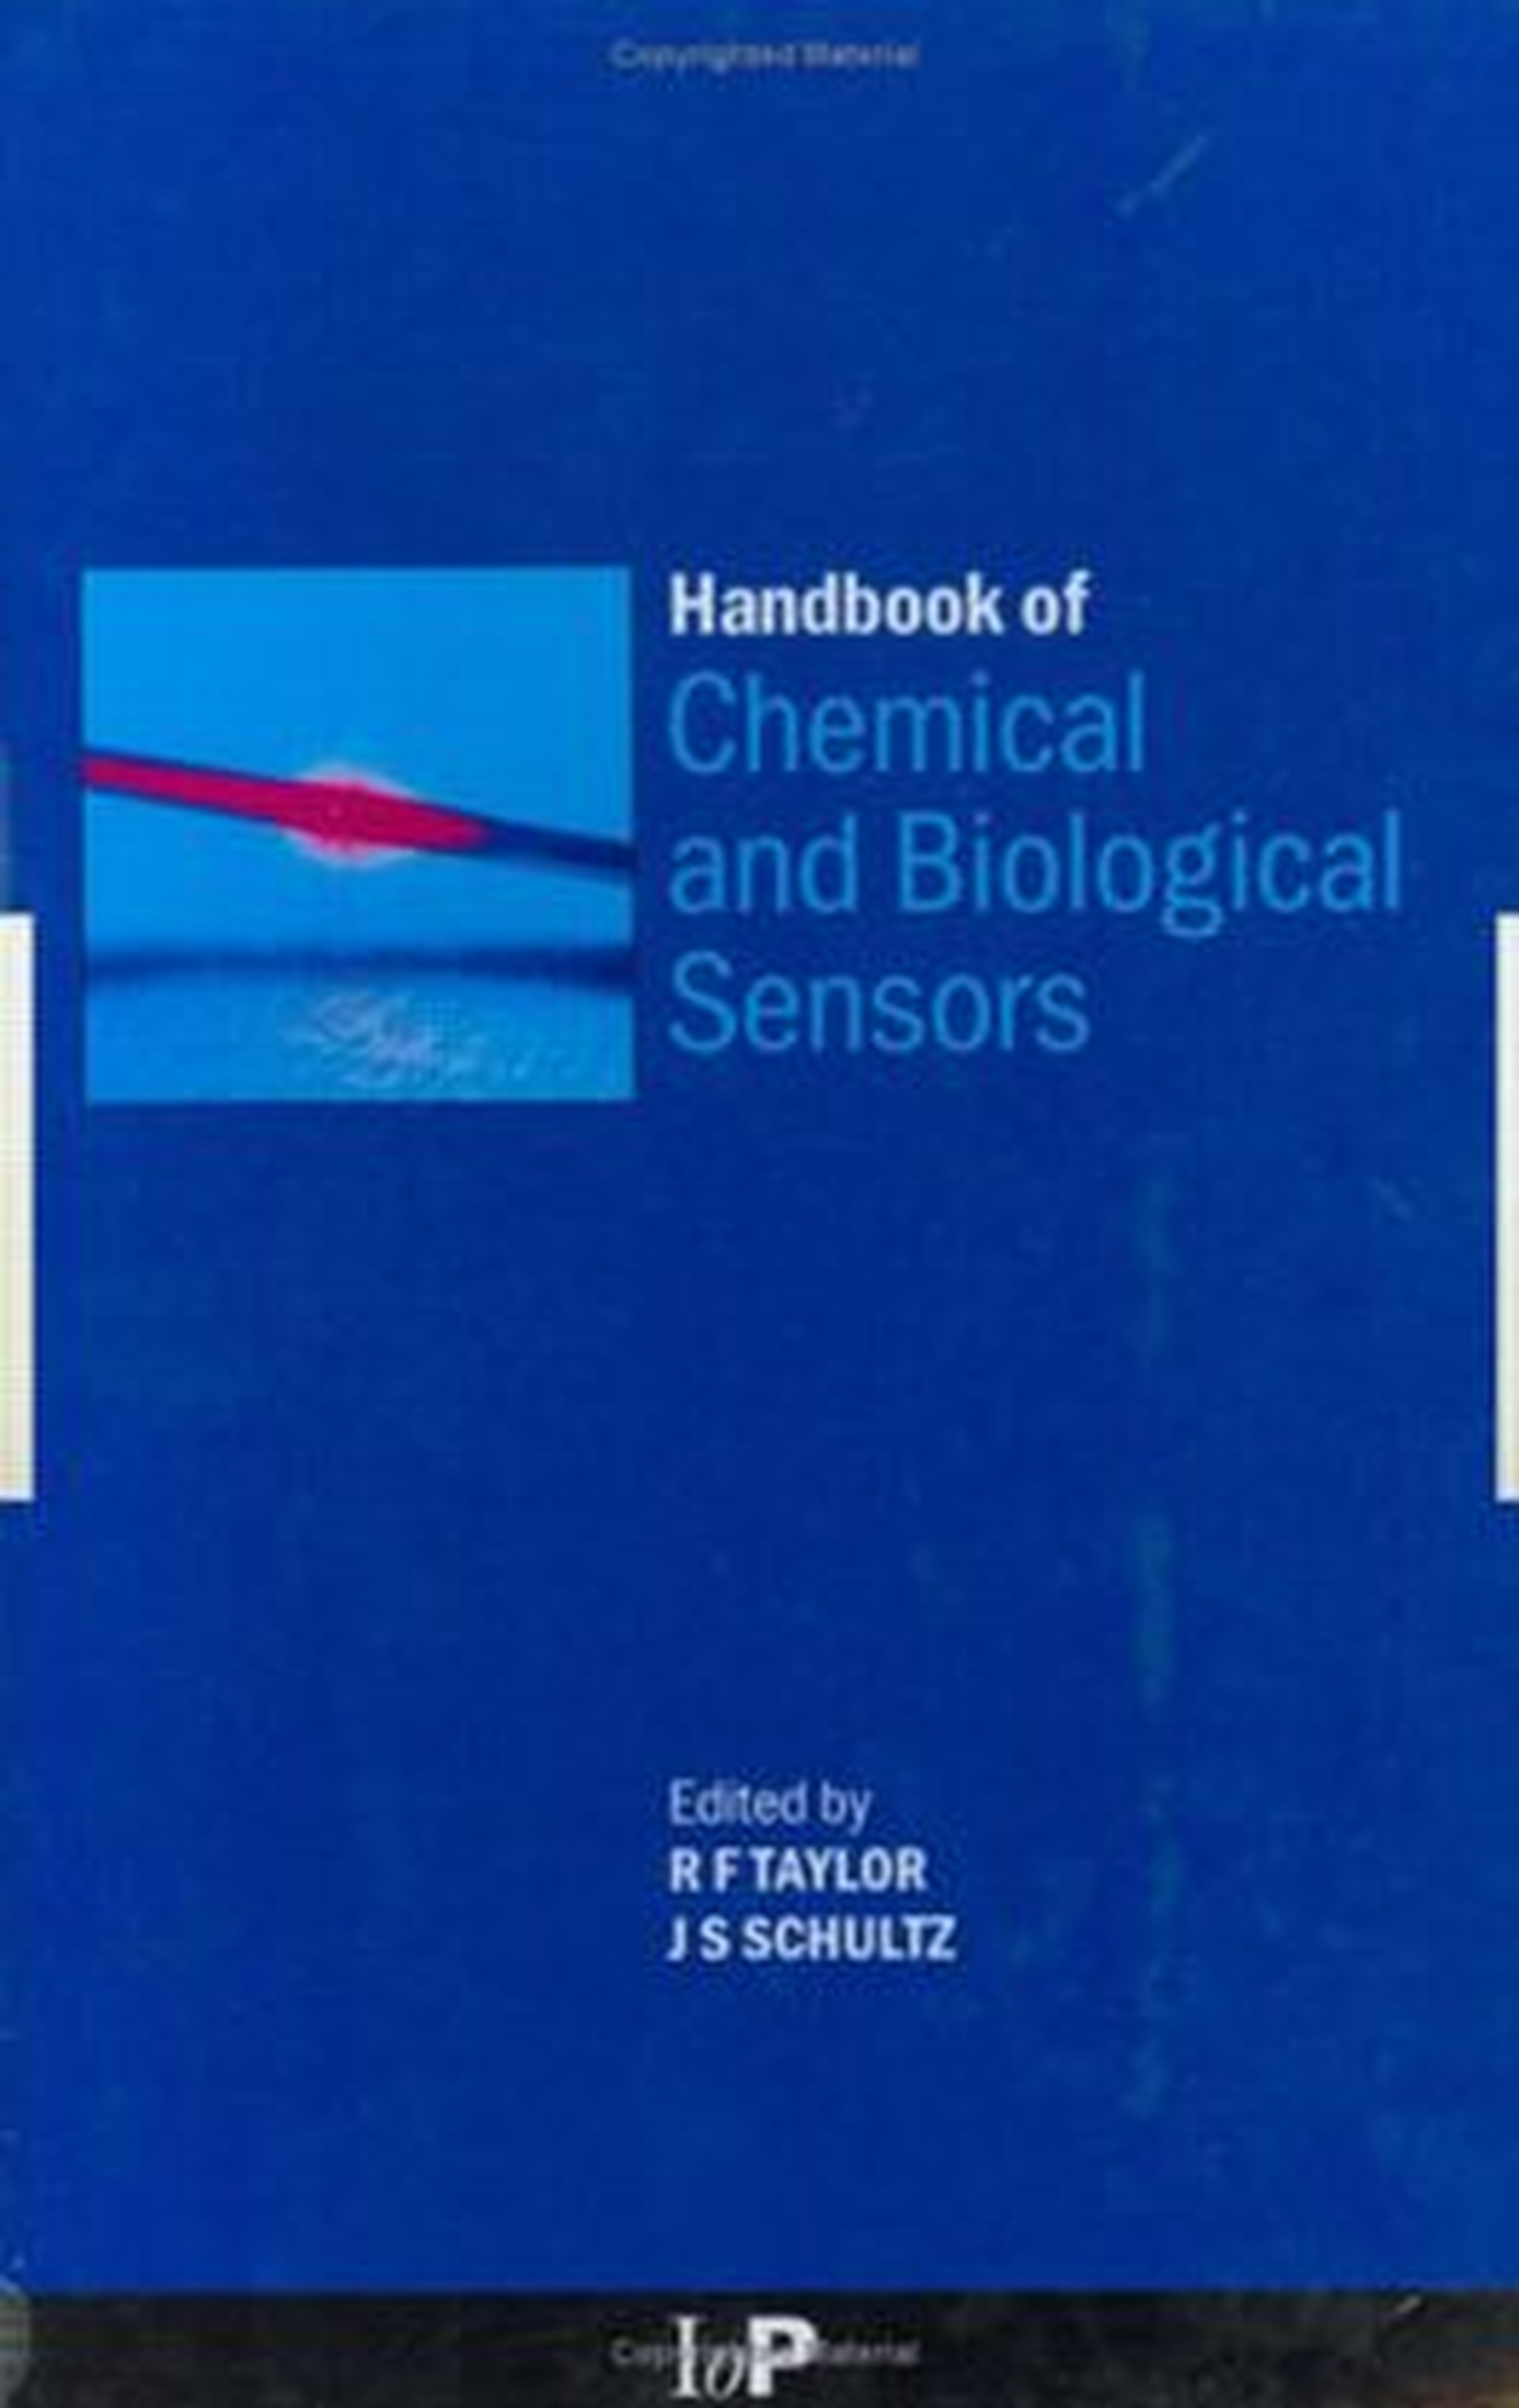 Handbook of Chemical and Biological Sensors: 1st Edition (Hardback) book cover